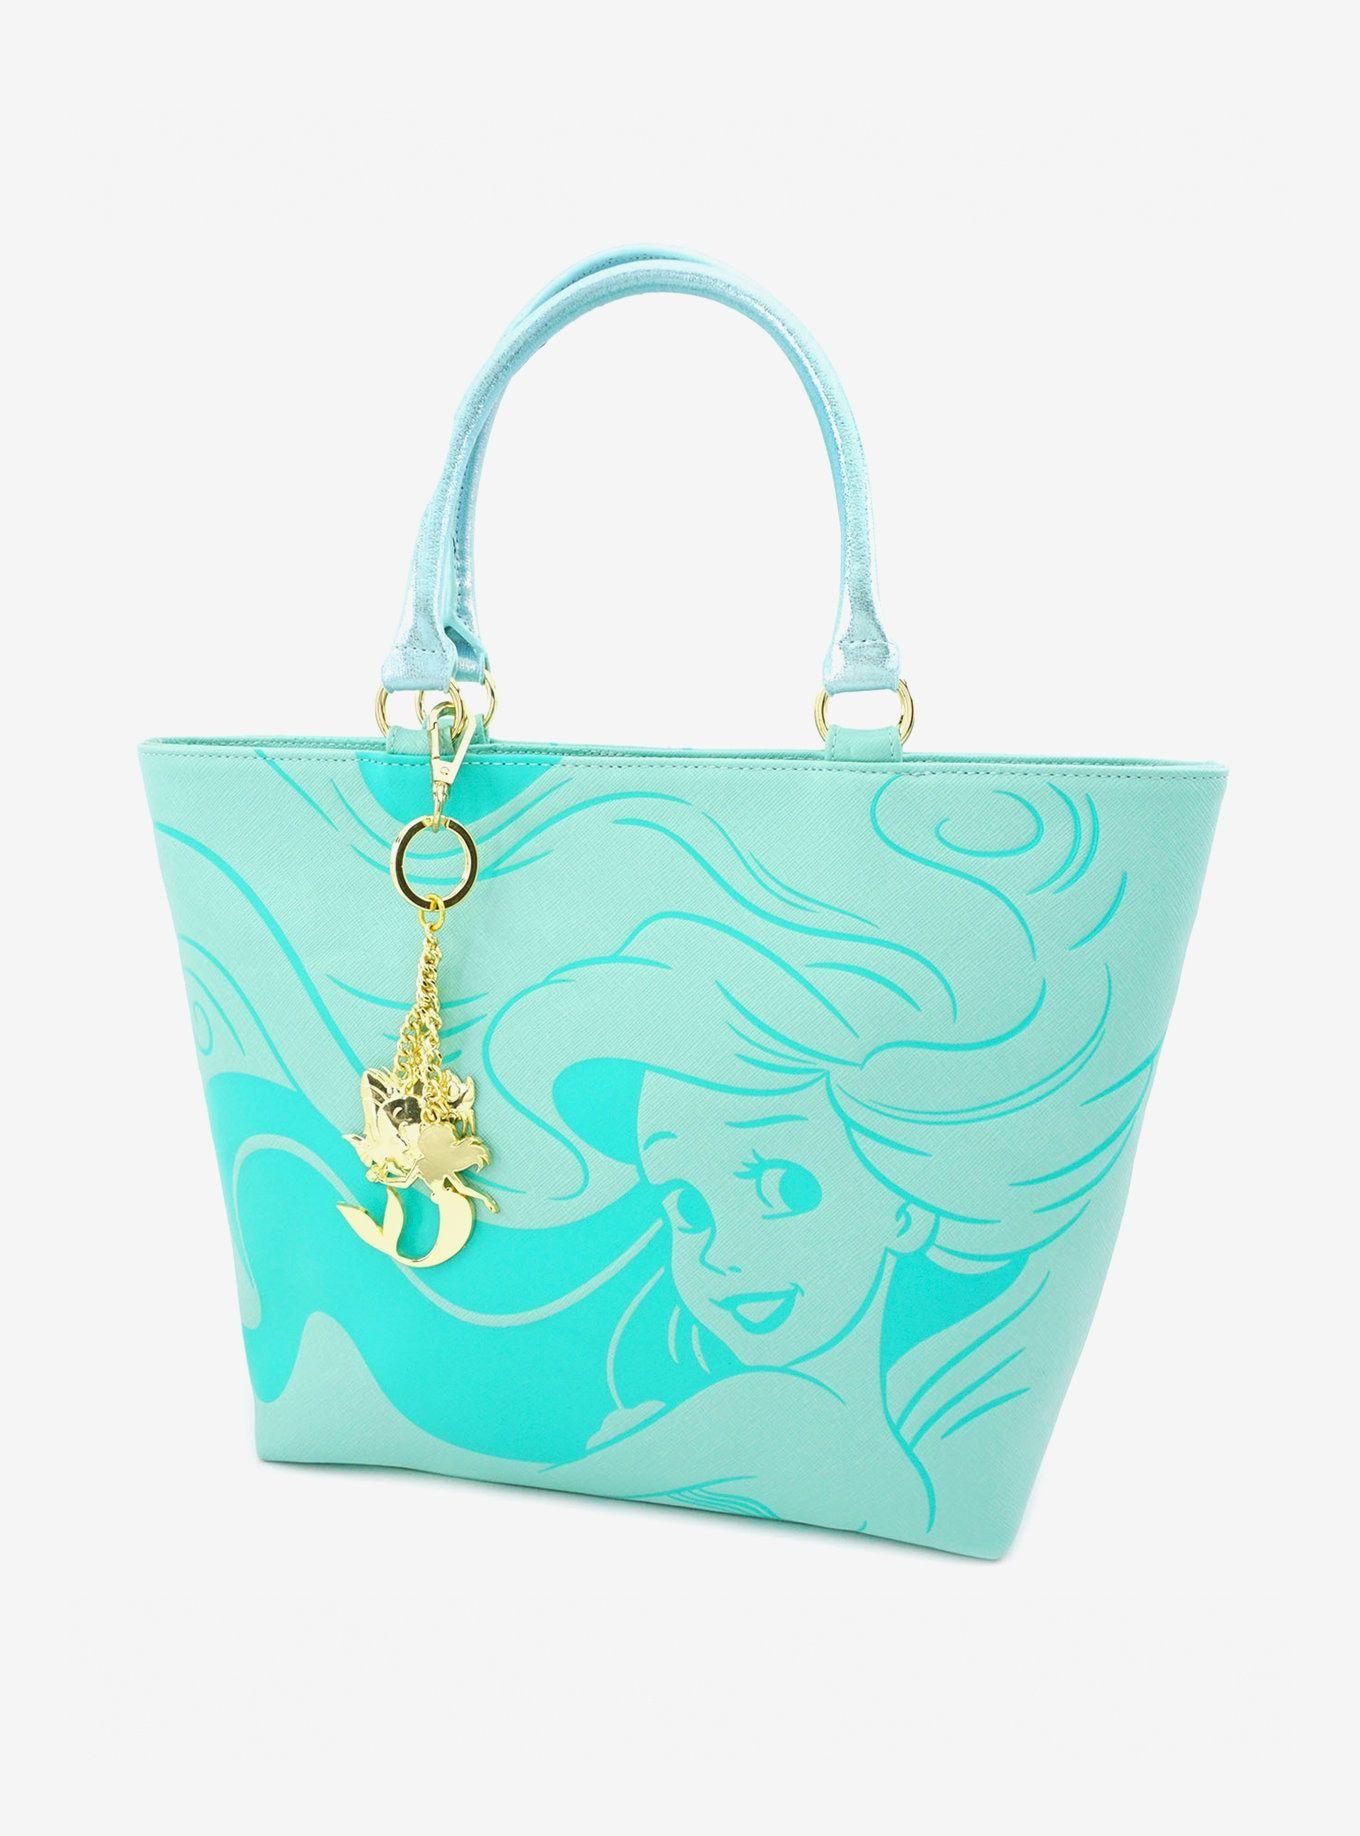 Little Mermaid Ariel Aqua Tote Bag